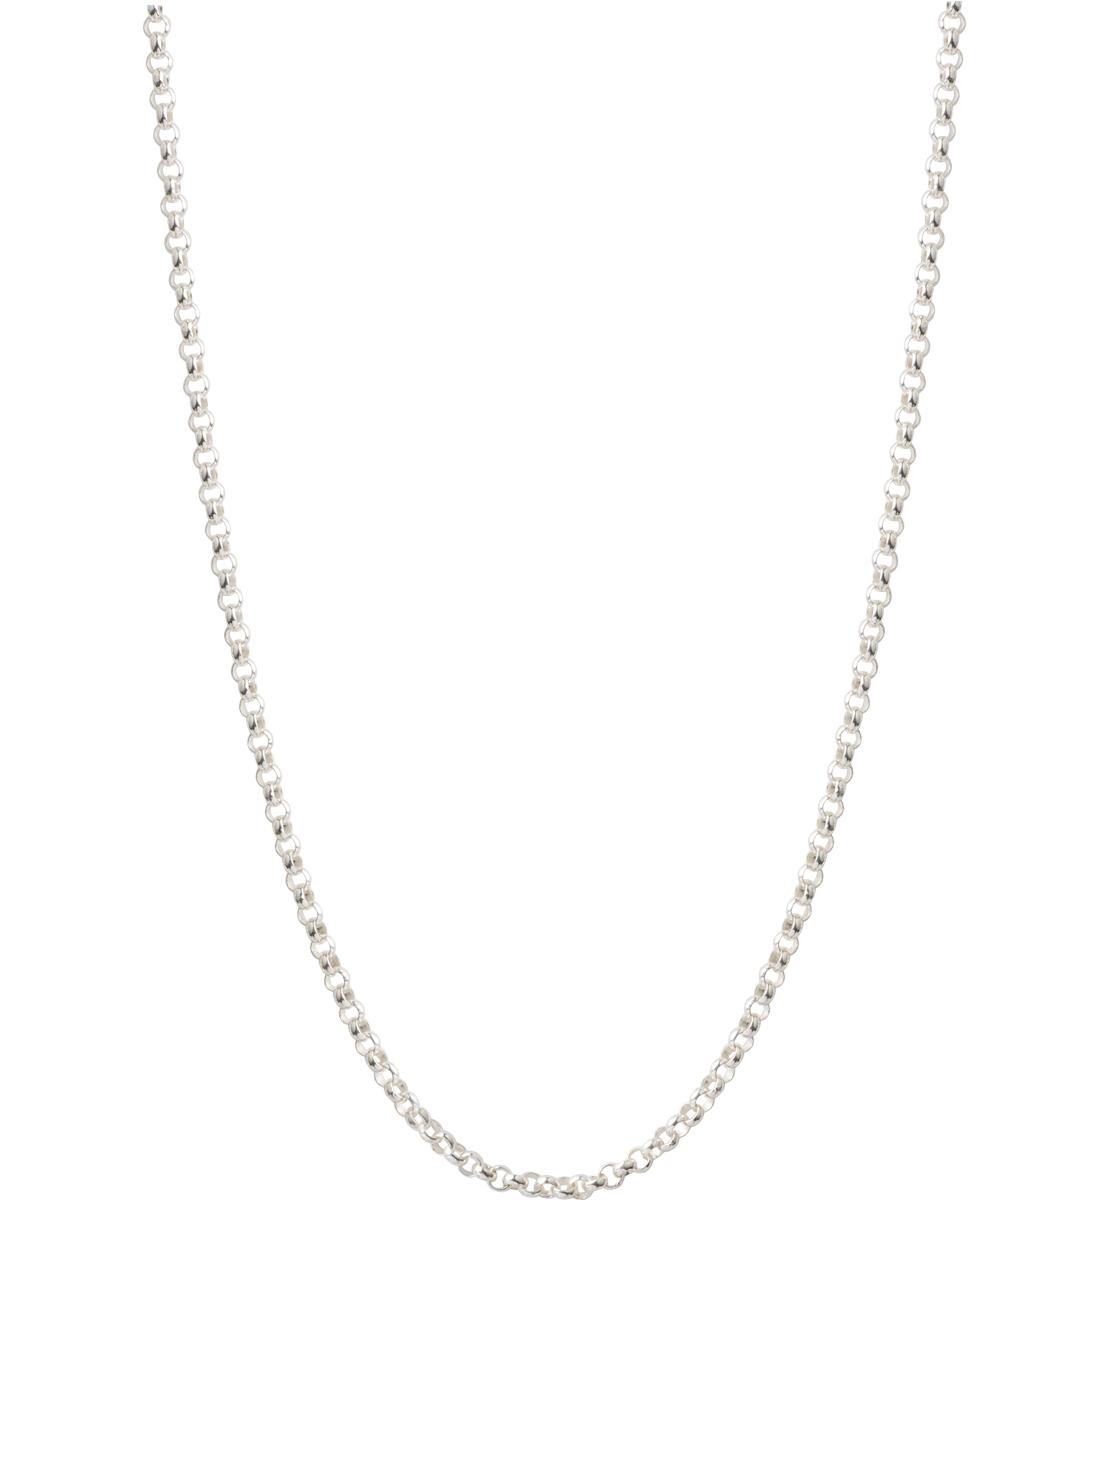 Thick Silver Belcher Chain